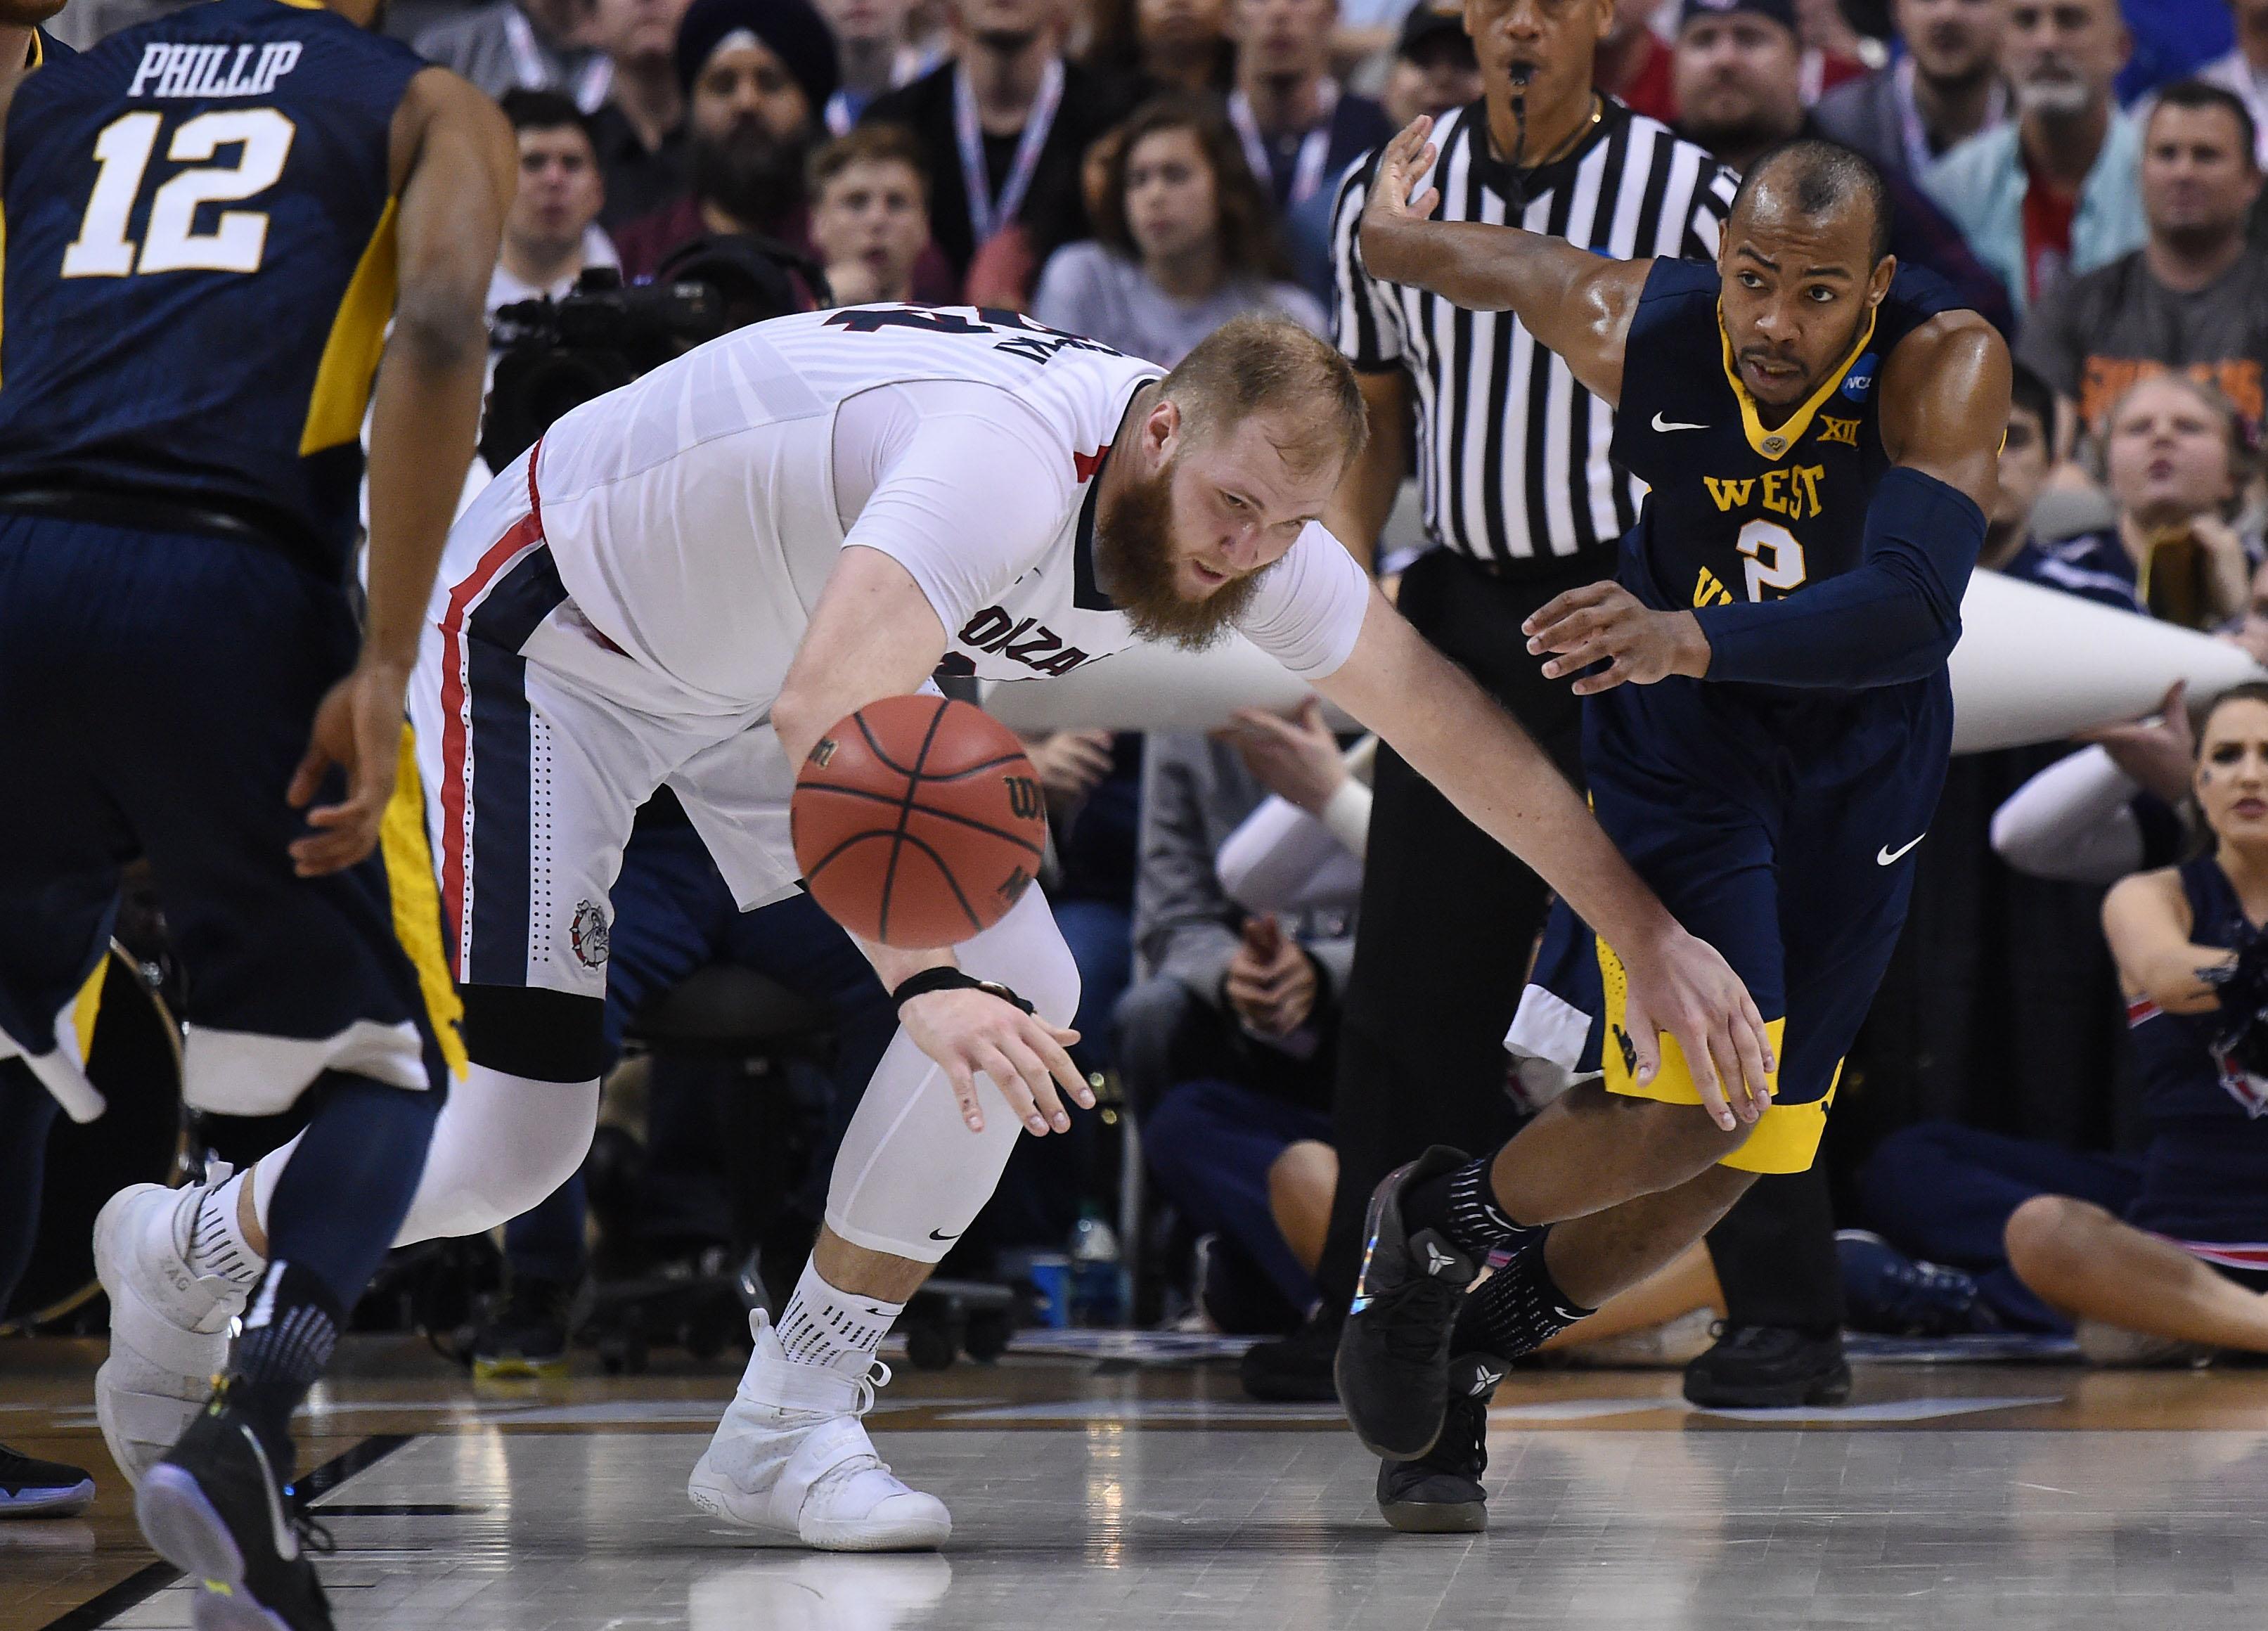 6b68e899390 Gonzaga center Przemek Karnowski (24) chases a loose ball with West  Virginia guard Jevon